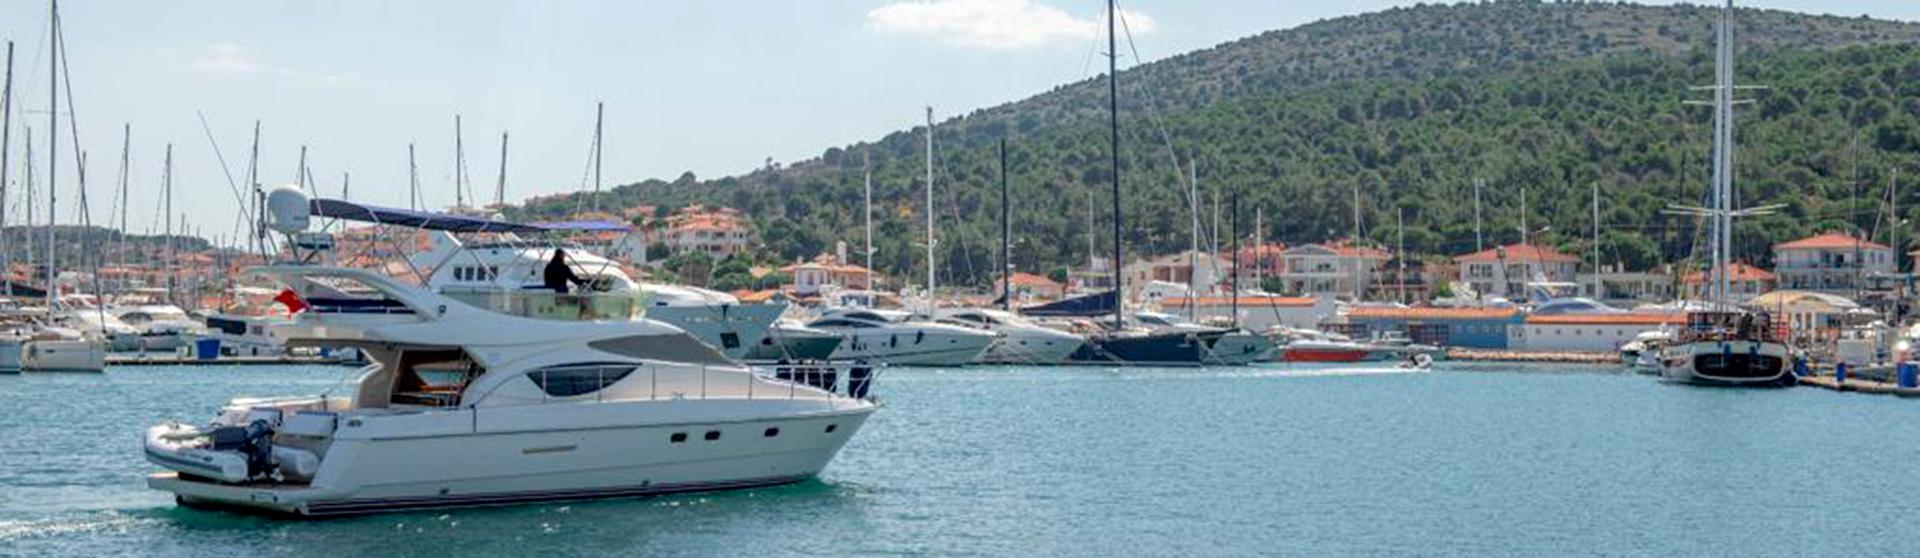 Tatlim-Motoryacht-Bodrum-NIS Yachting